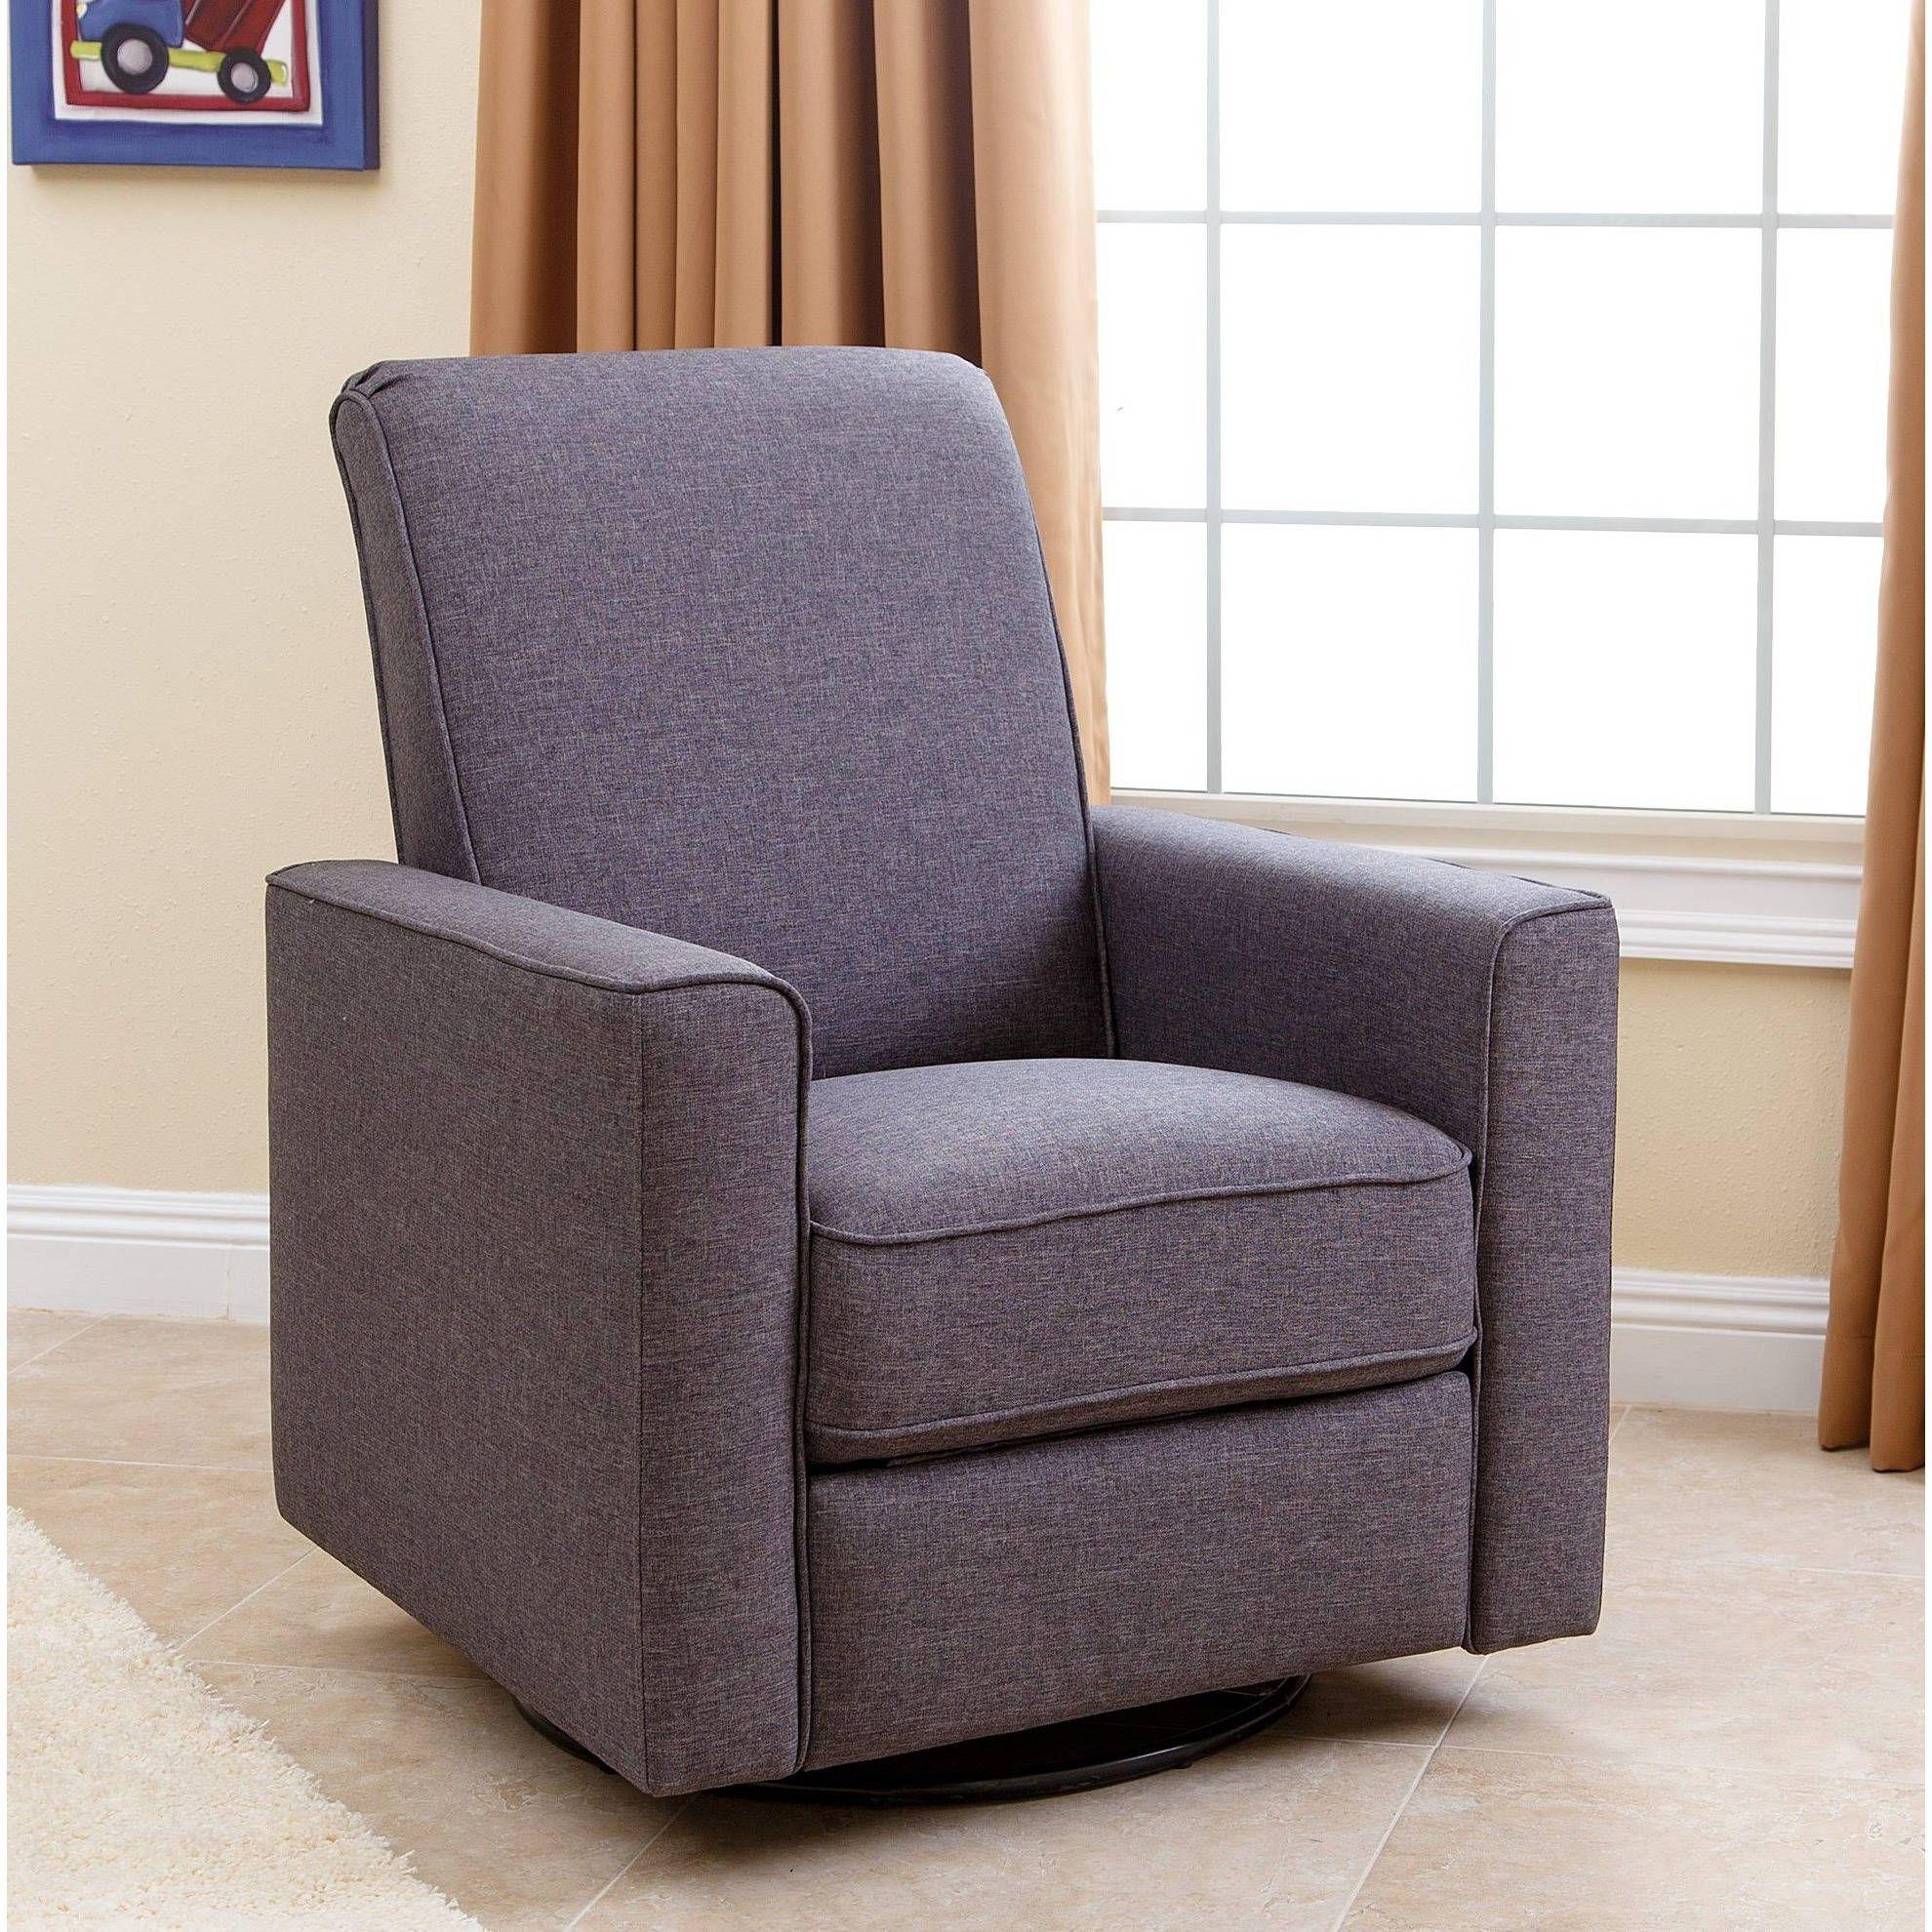 Abbyson Hampton Grey Nursery Swivel Glider Recliner Chair Fabric